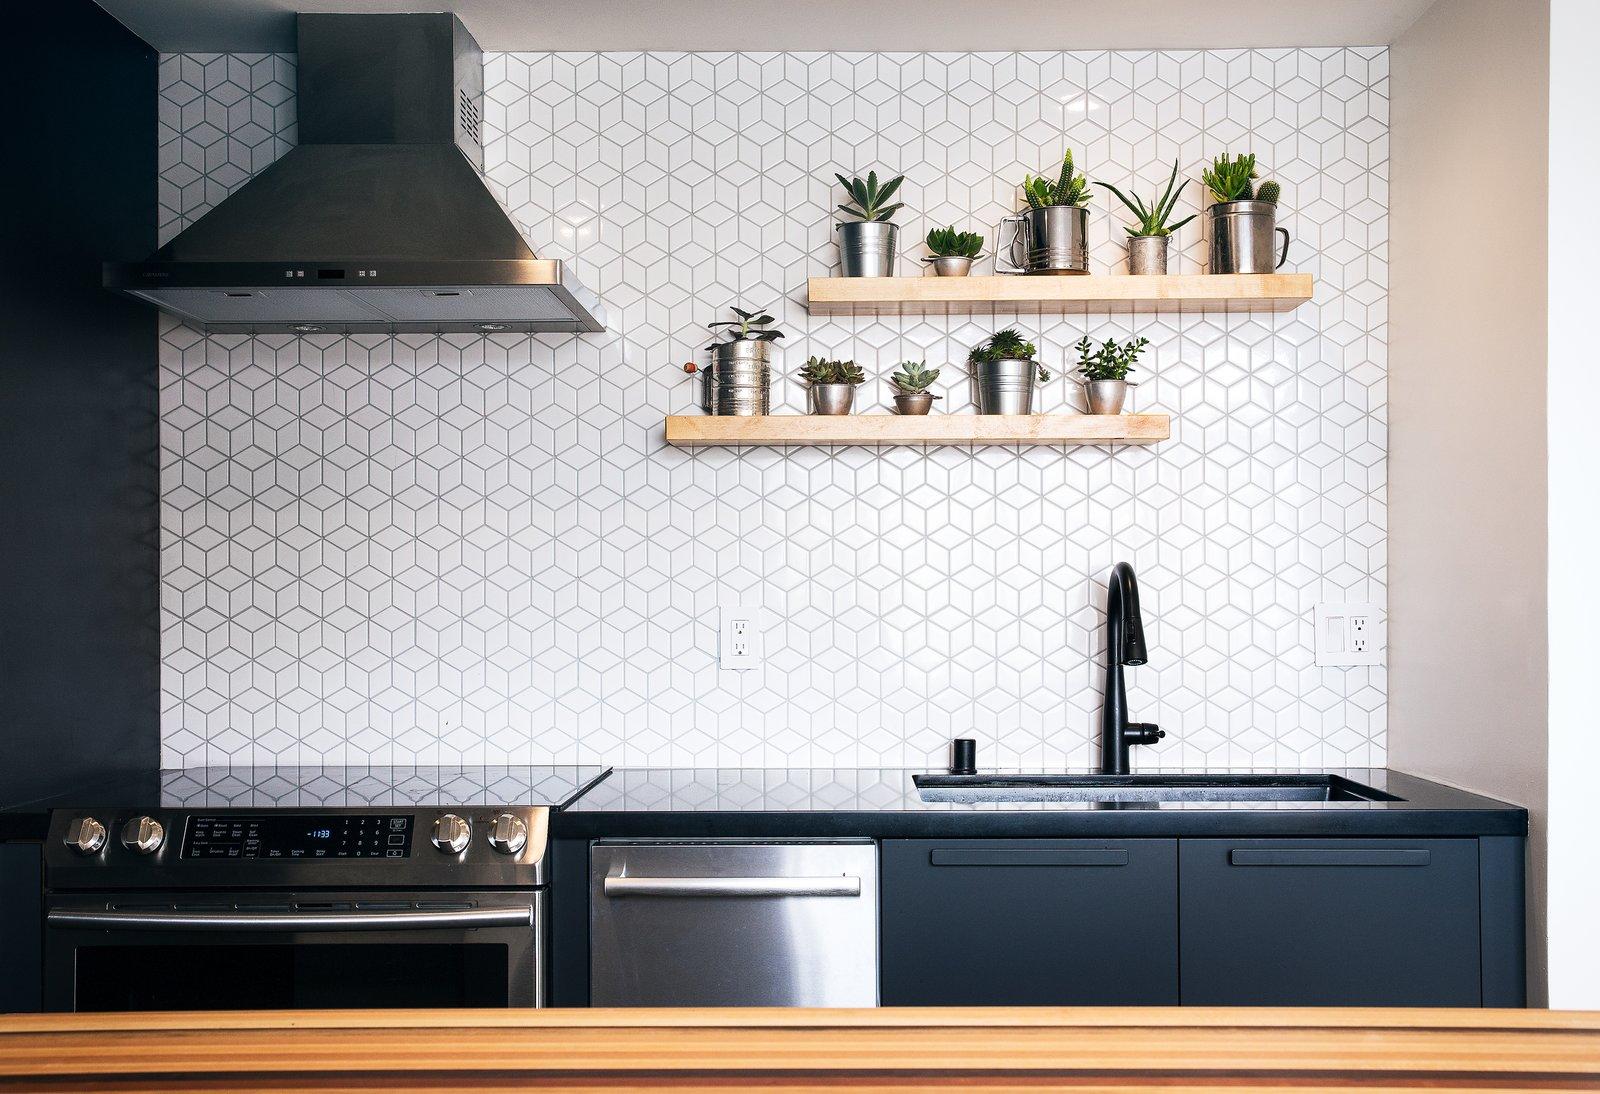 Mission Loft kitchen backsplash